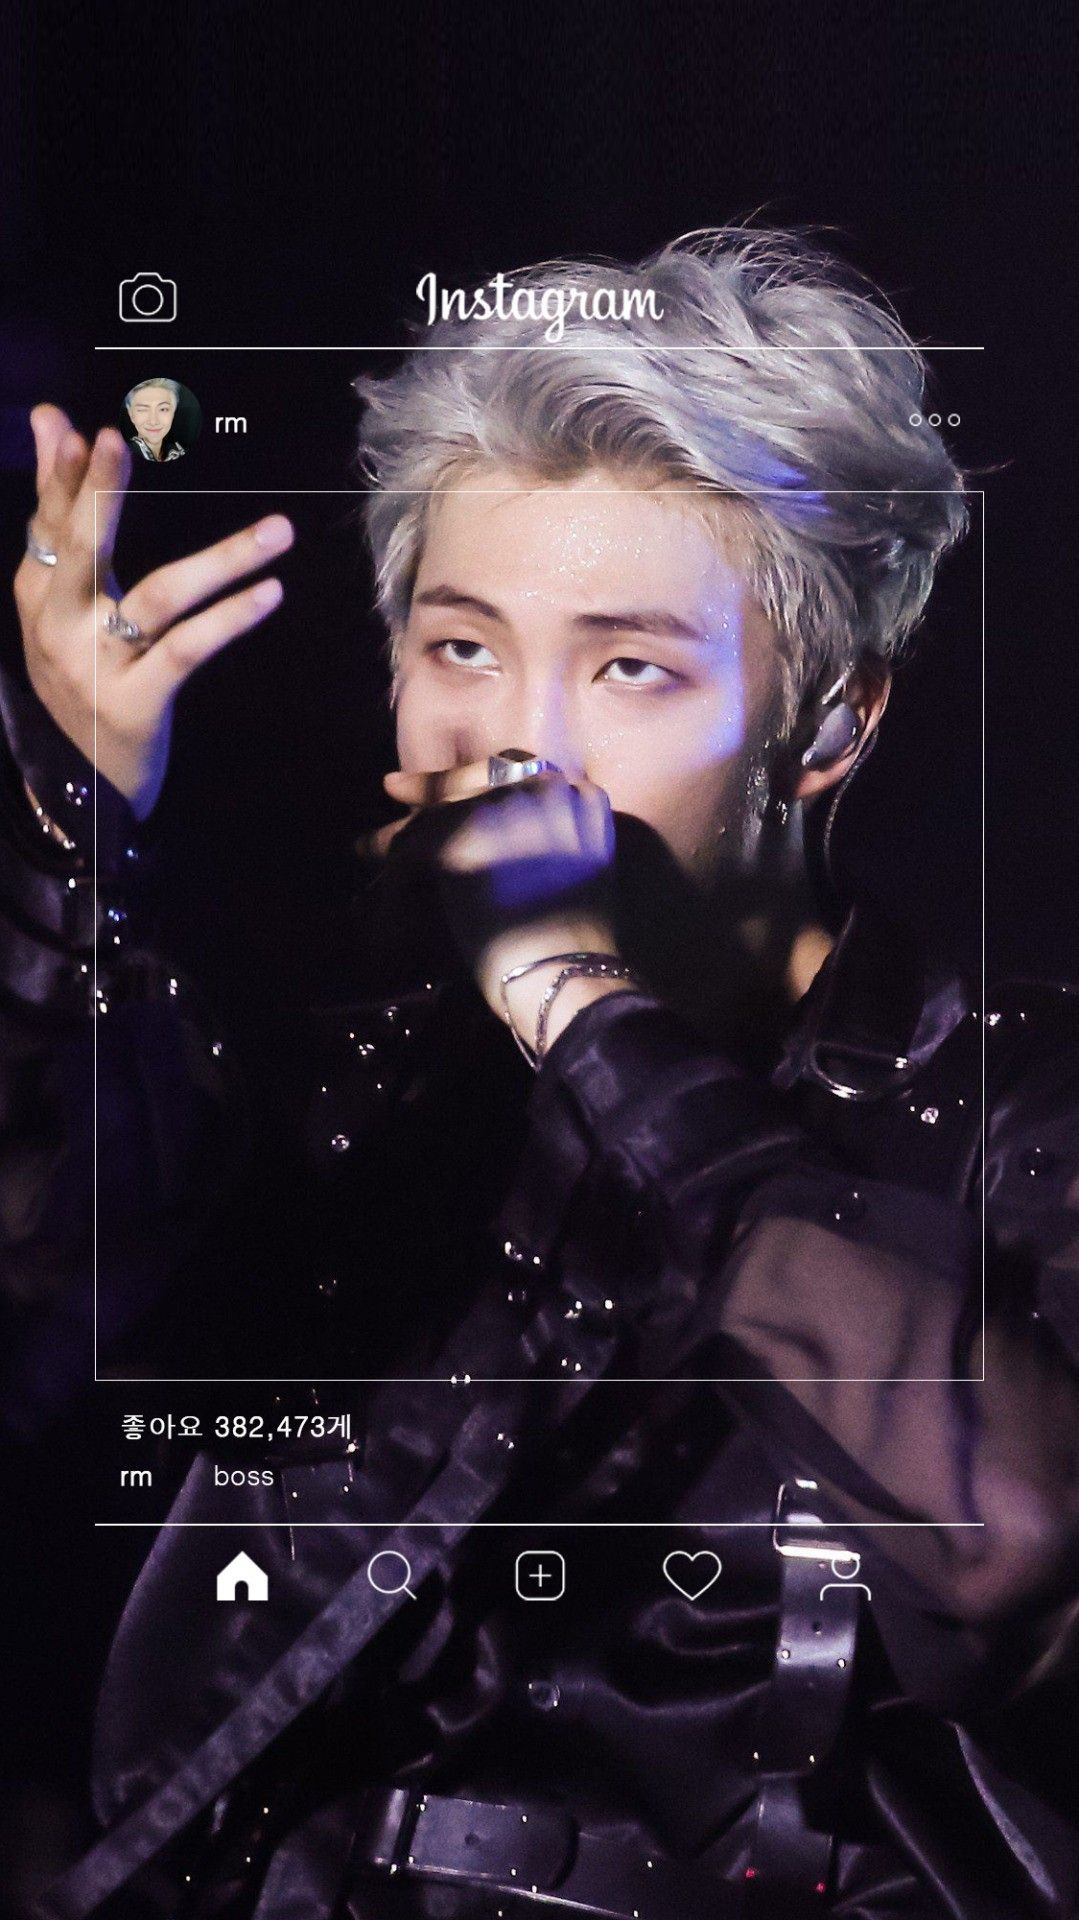 Bts Rm Wallpaper Namjoon Bts Wallpaper Bts Rap Monster Bts Aesthetic Pictures Wallpaper aesthetic rm bts